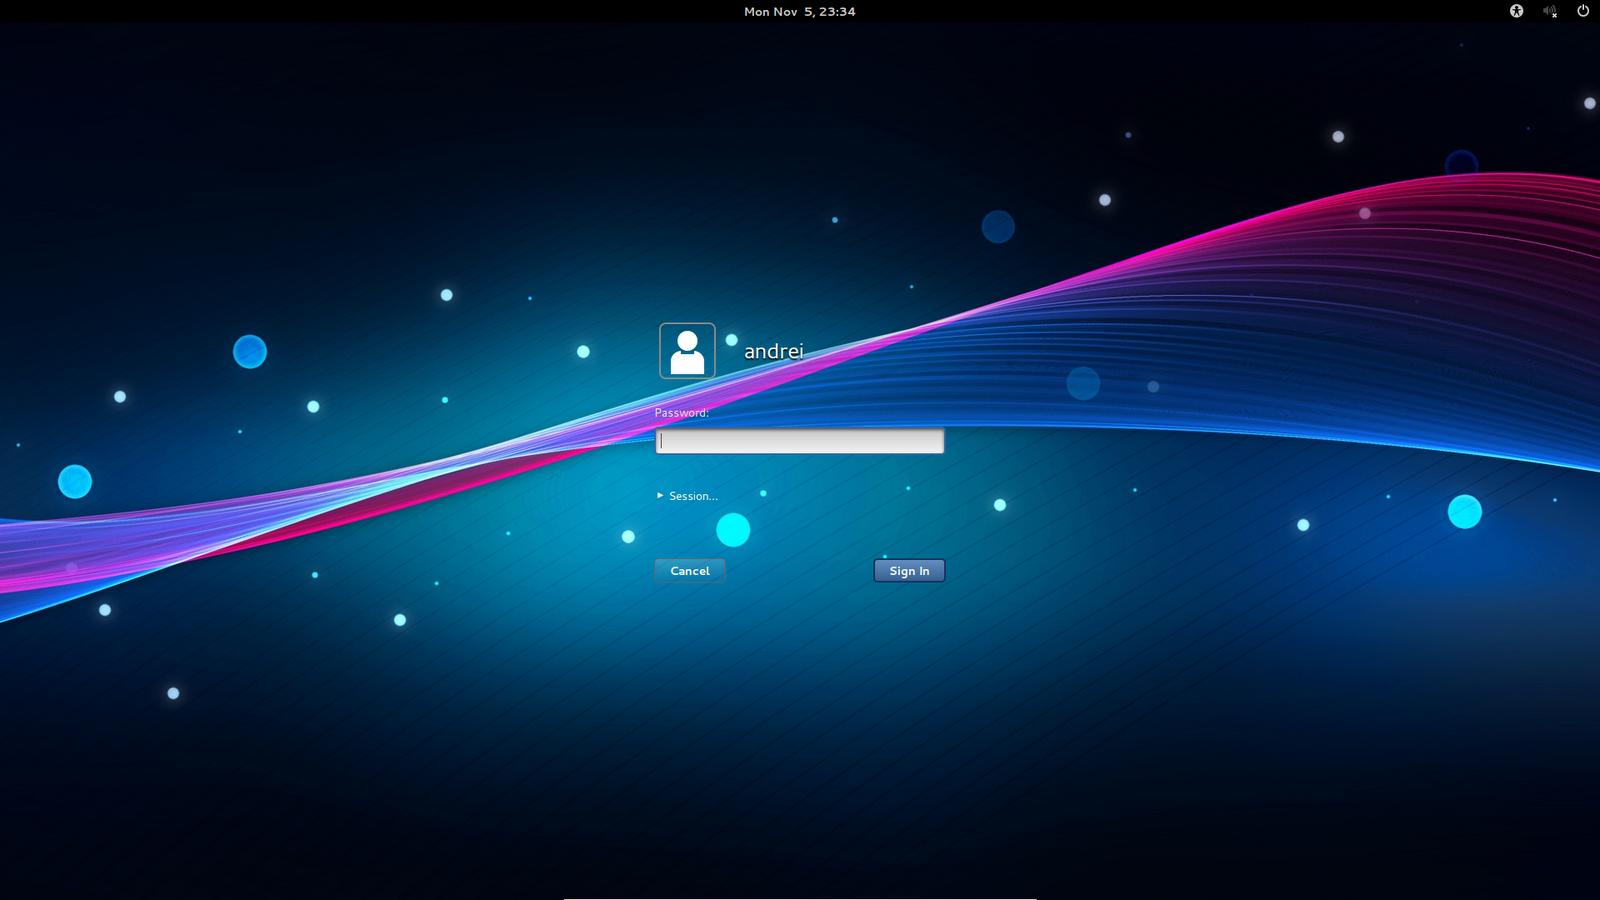 Free download Lock Screen Change Theme Wallpaper Web Upd8